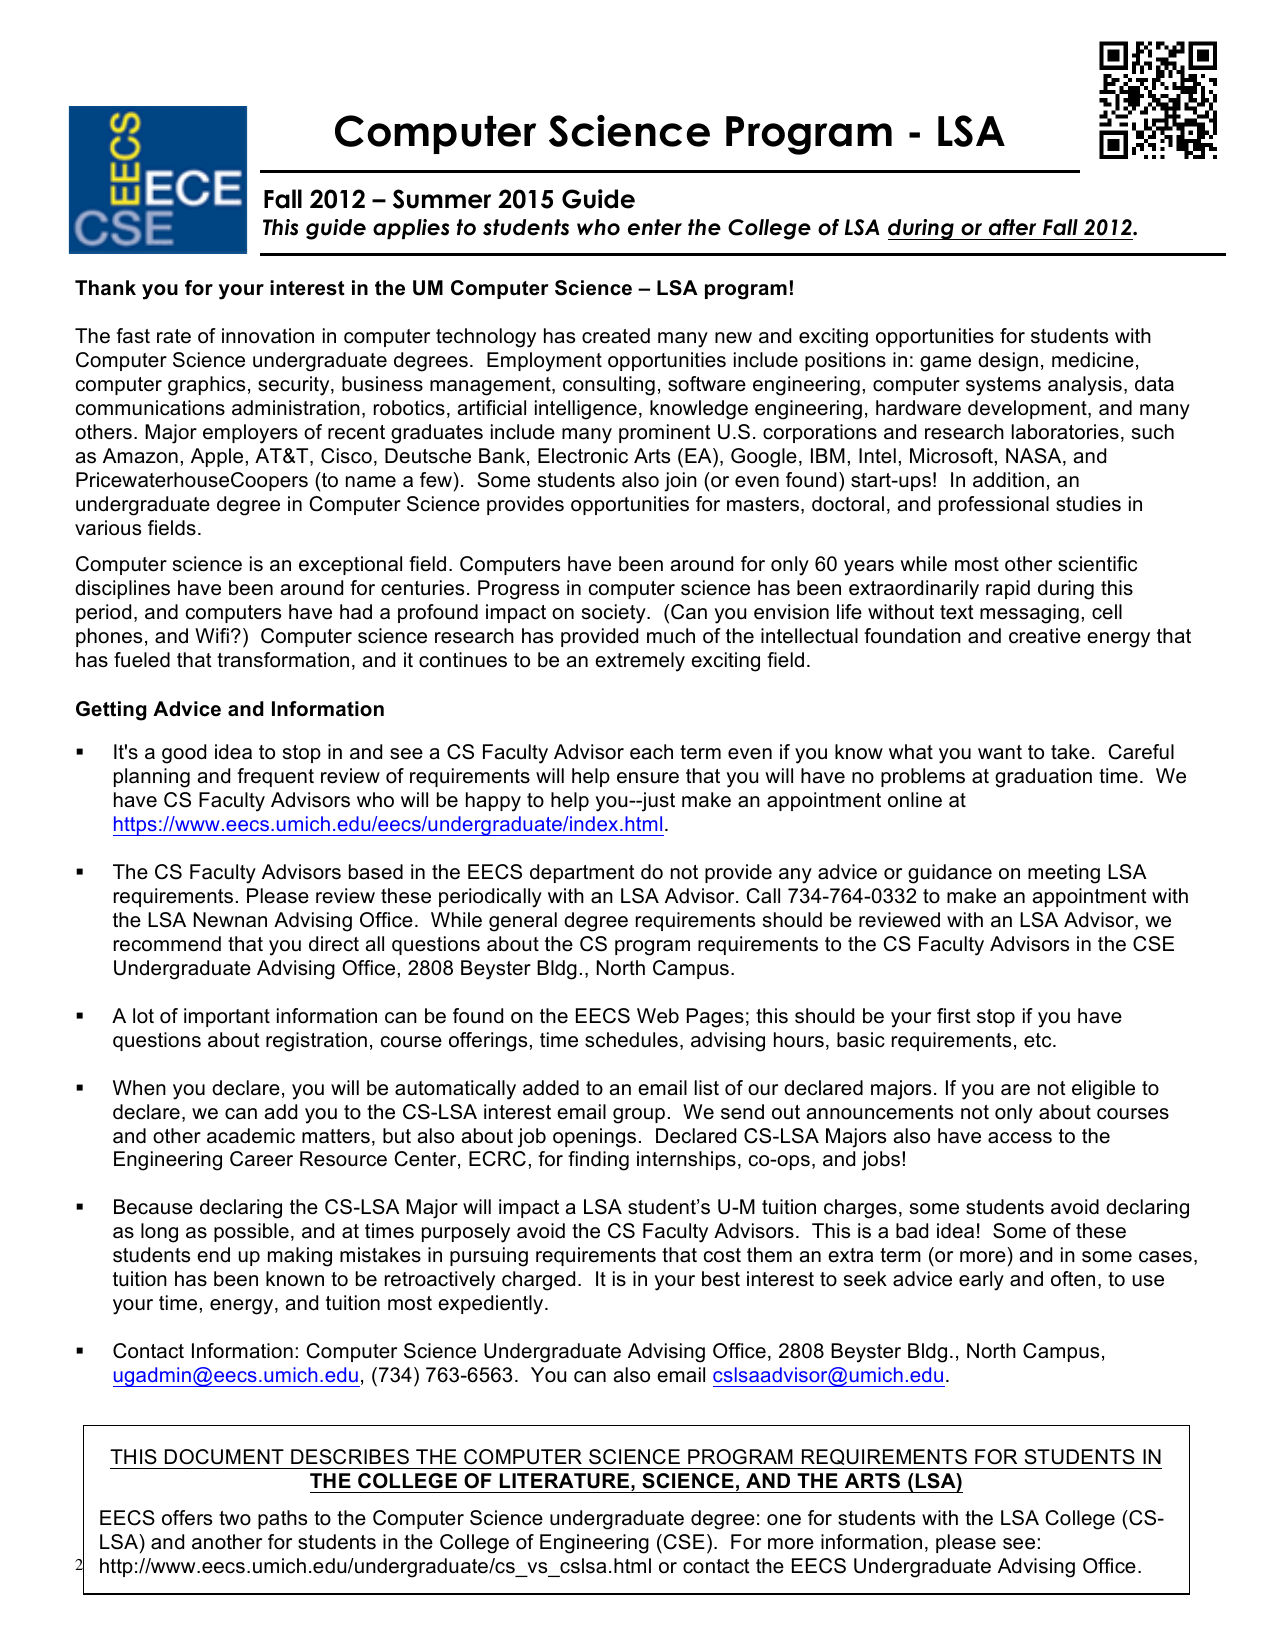 Phd level dissertation consultation services